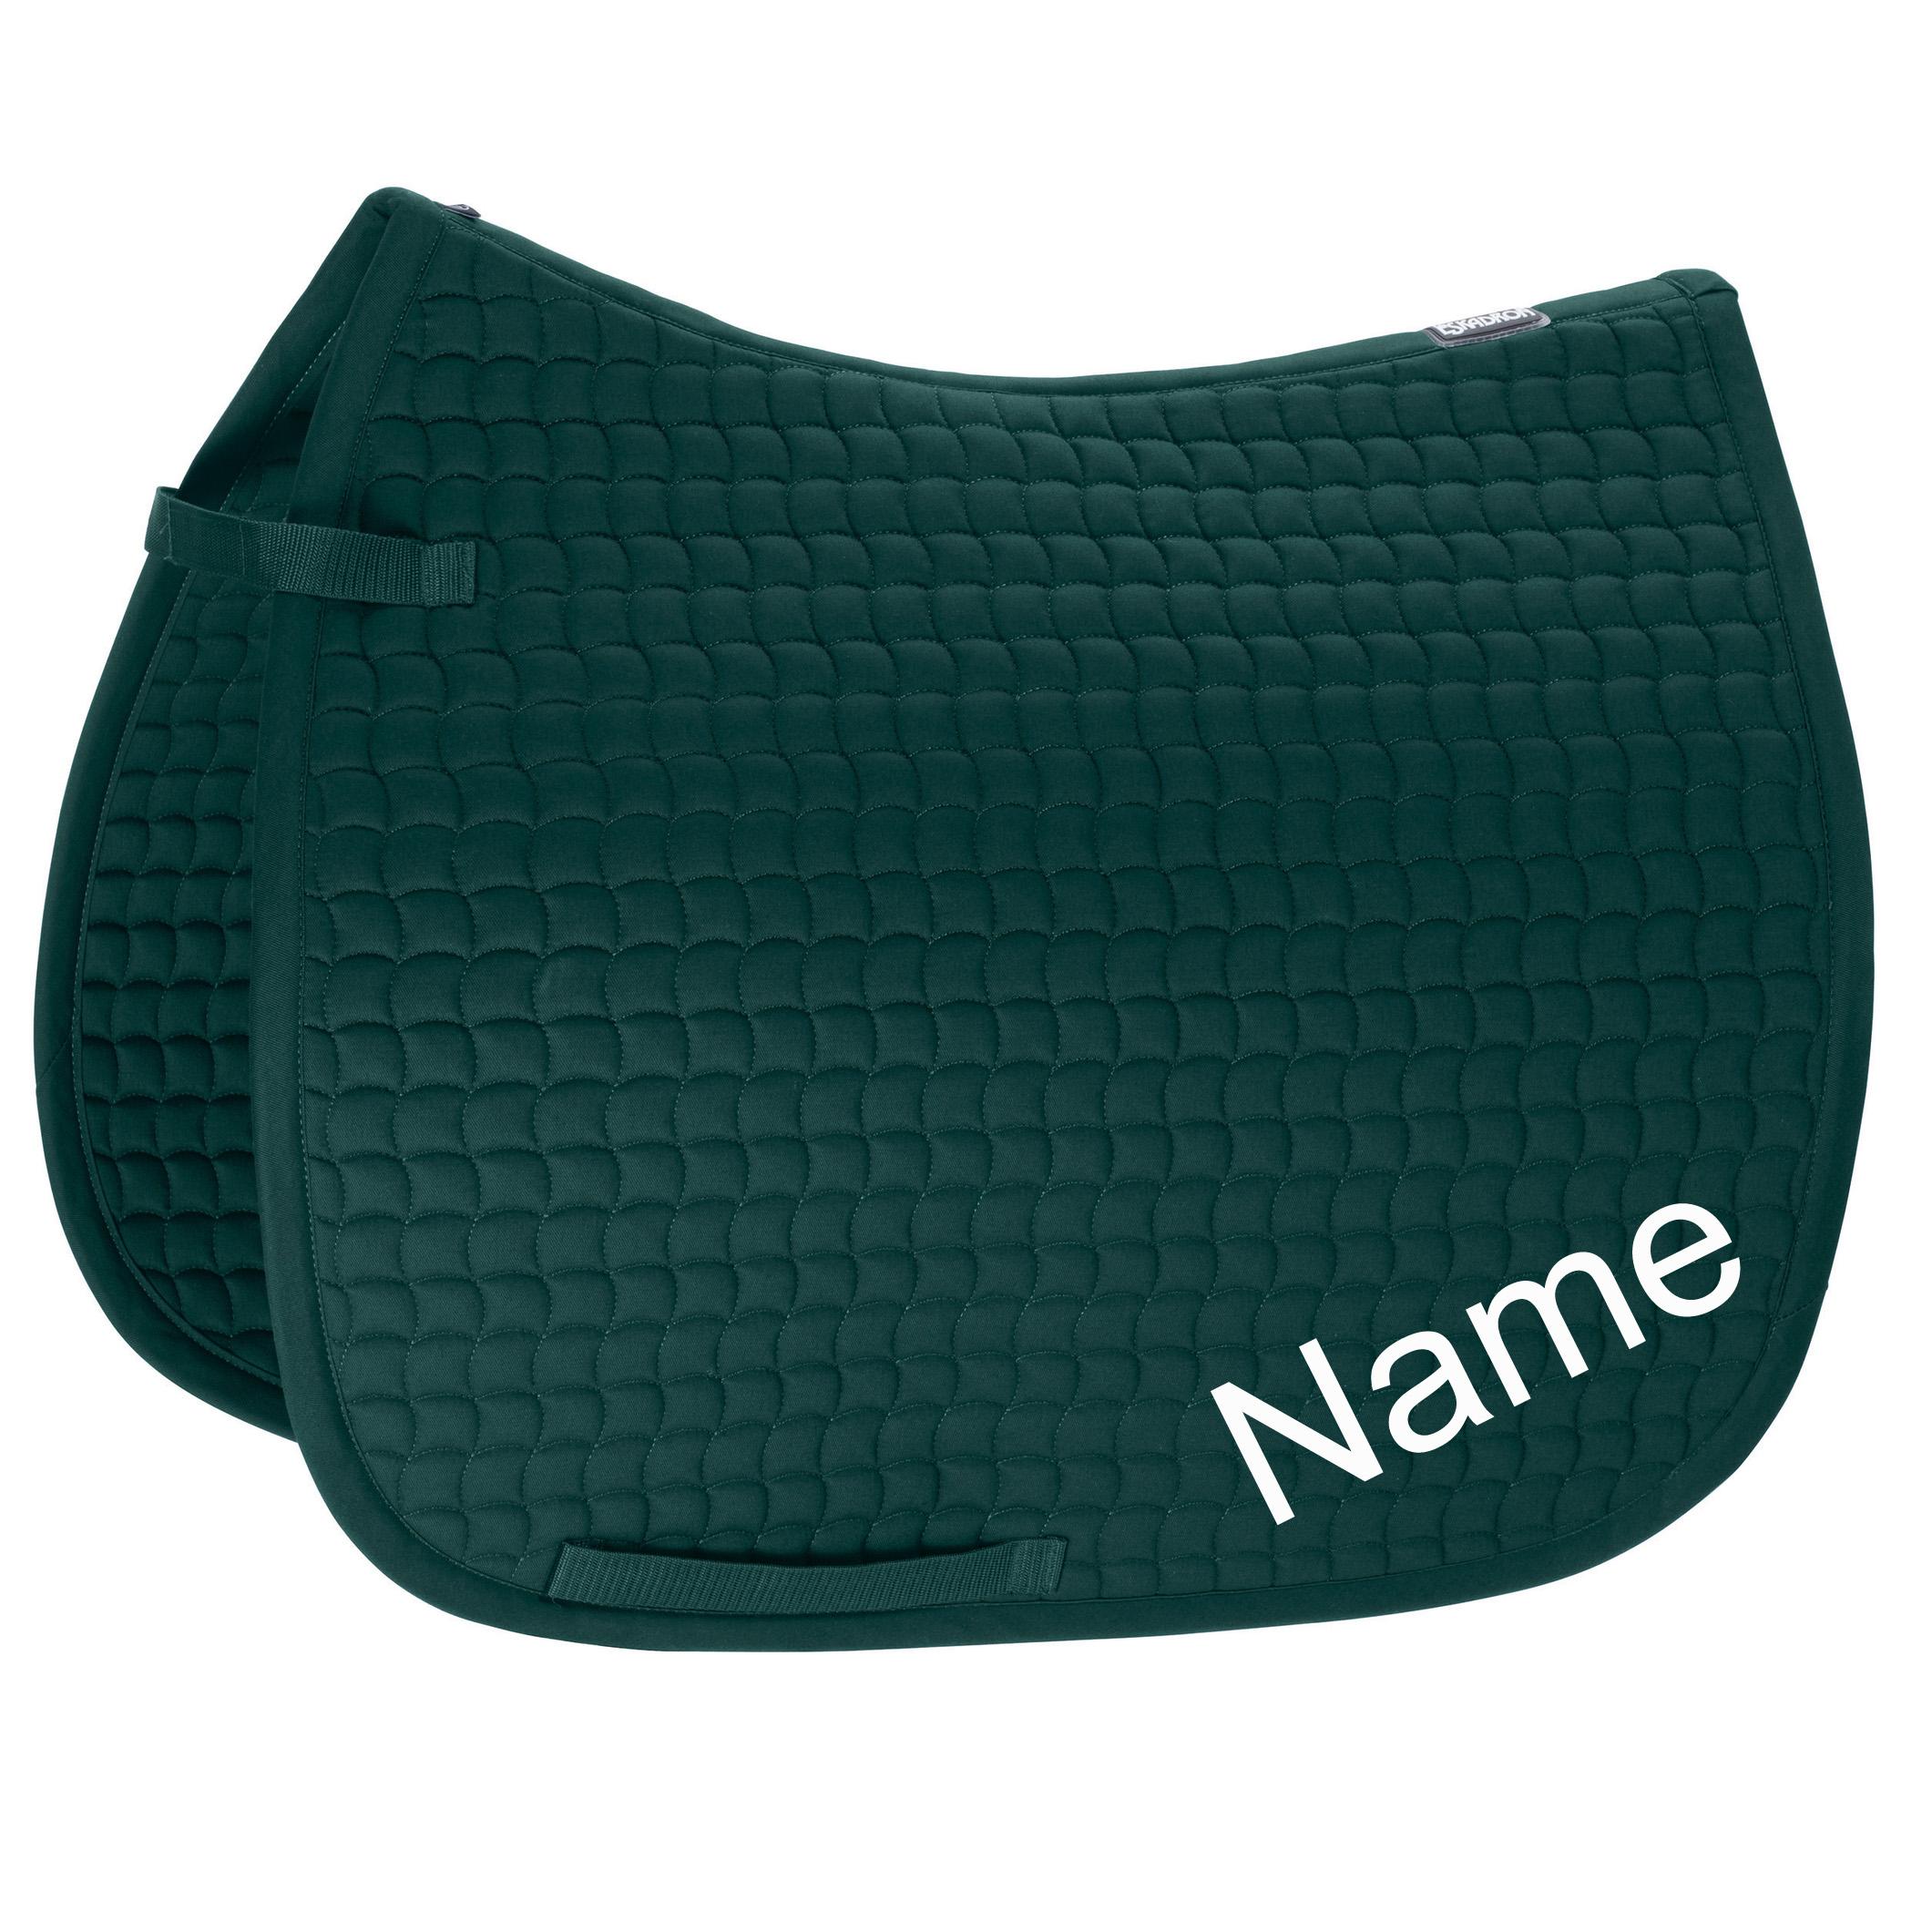 ESKADRON racinggreen Cotton Pony Dressur-Schabracke mit individuellem Namen bestickt